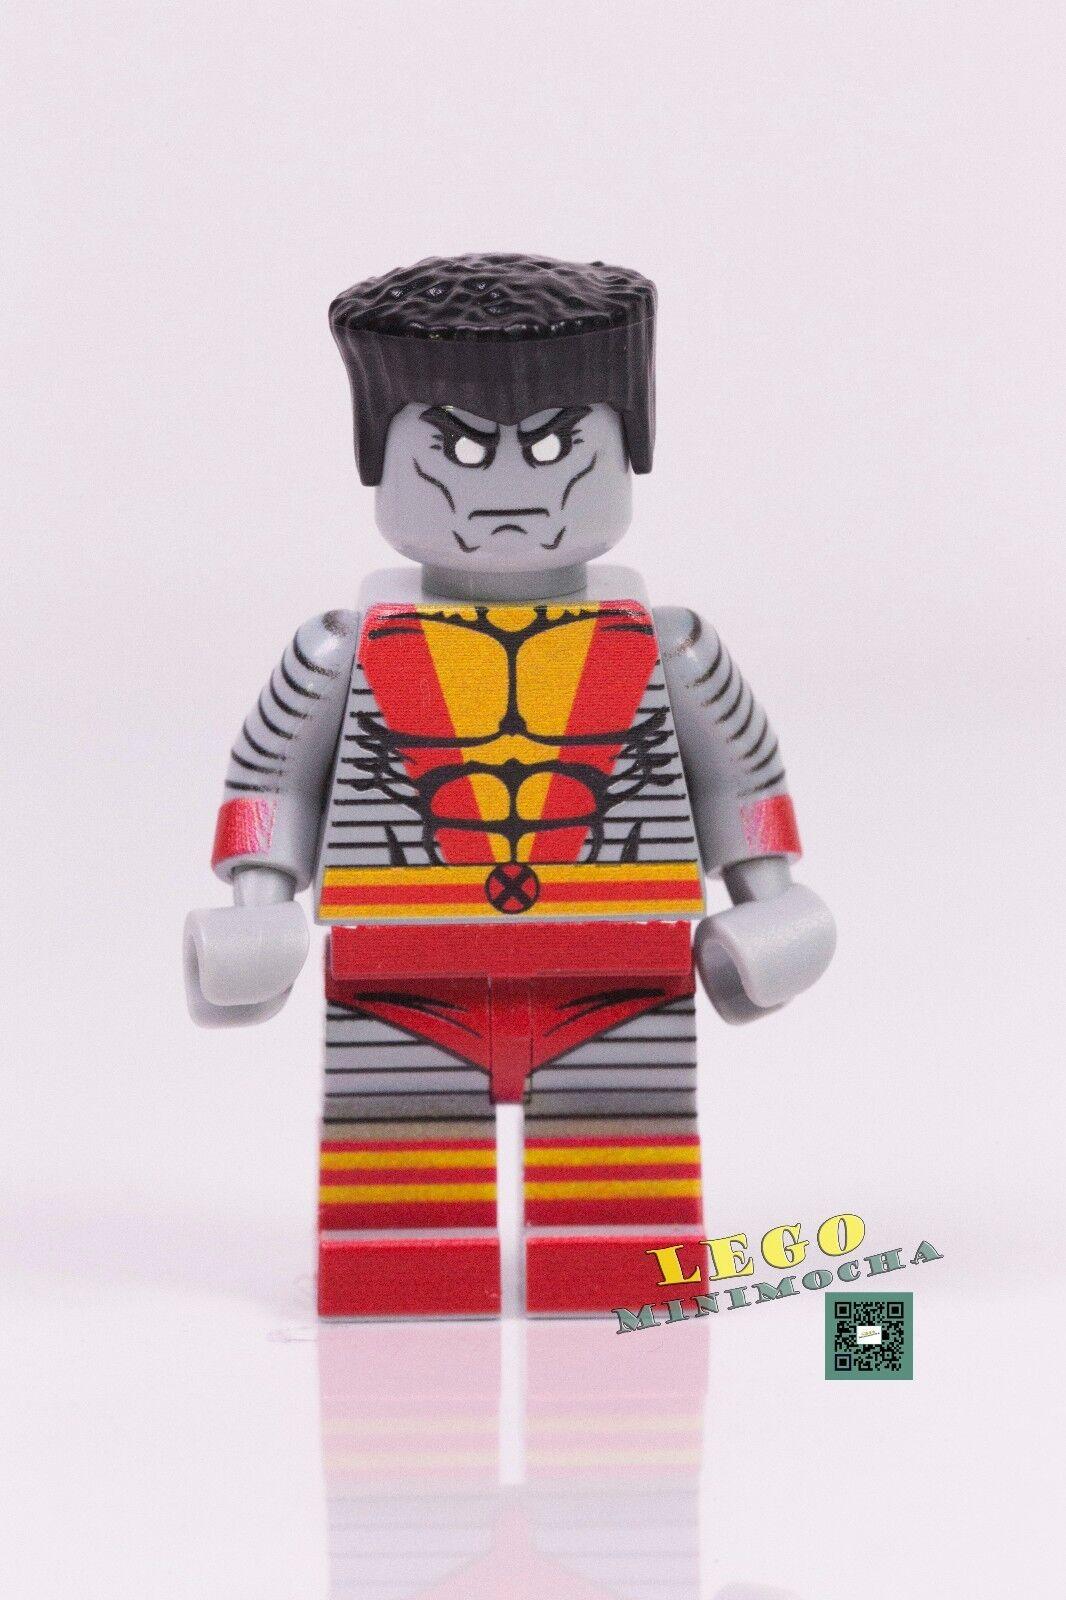 Custom Legends Deadpool v3 Blue Marvel super heroes minifigures on lego bricks